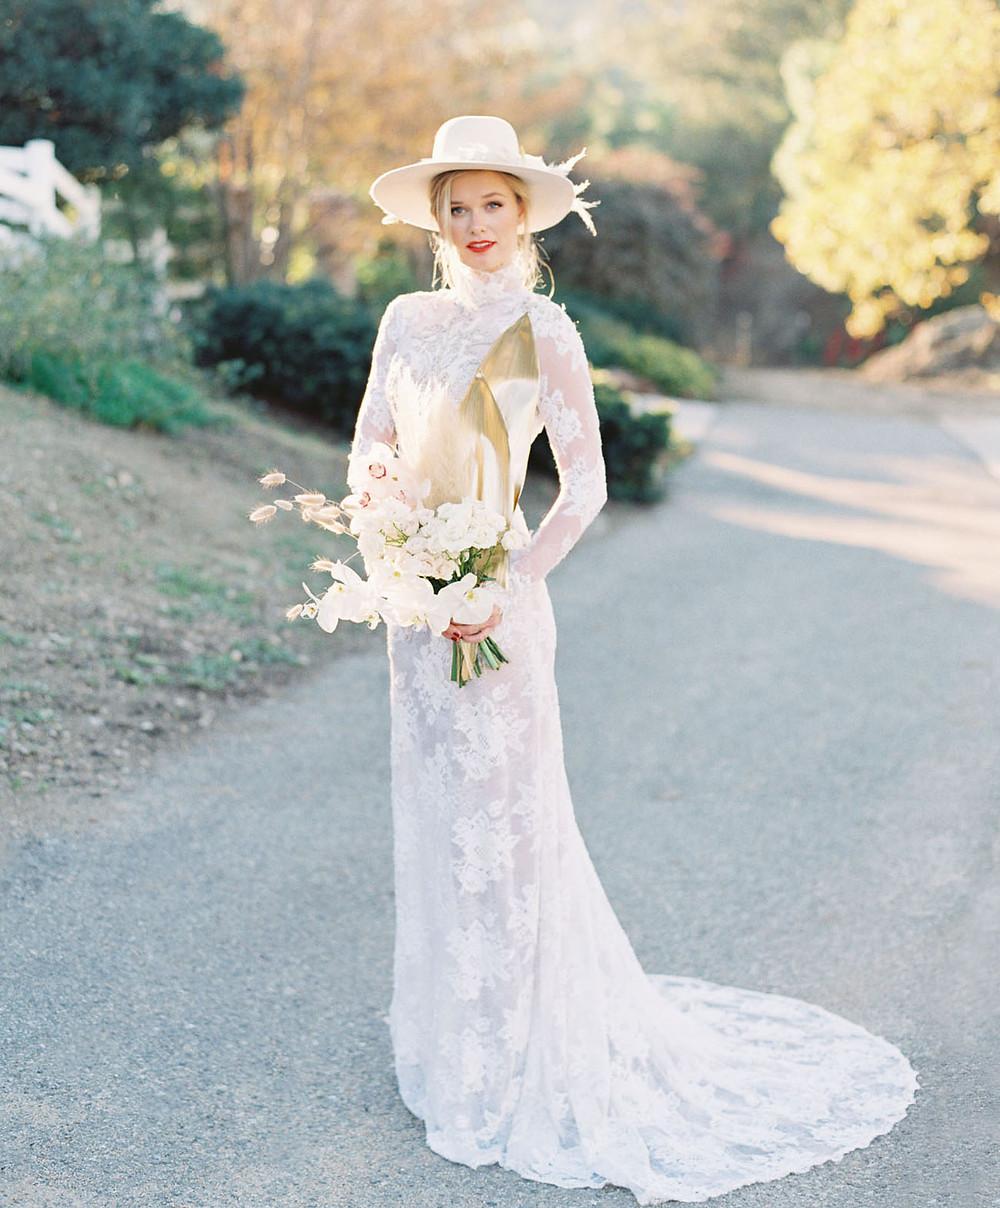 bride in wedding dress wearing bridal hat